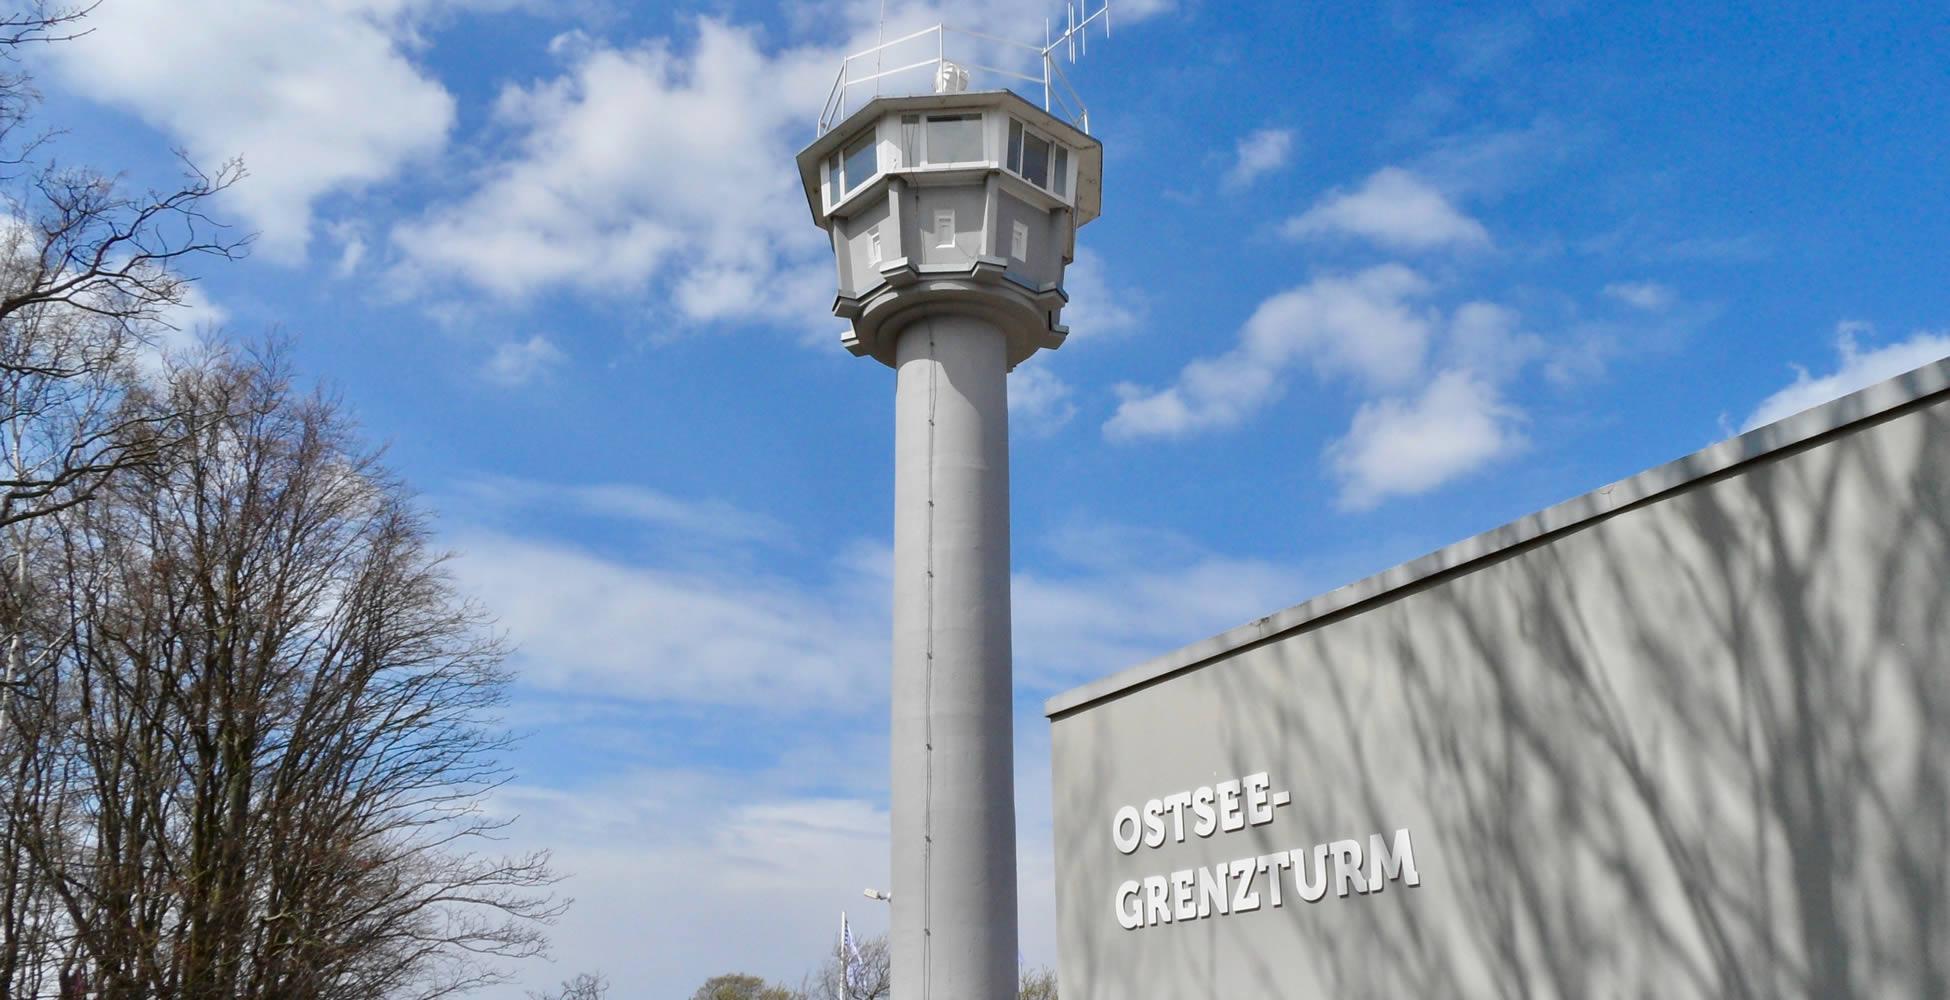 Grenzmuseum Ostsee